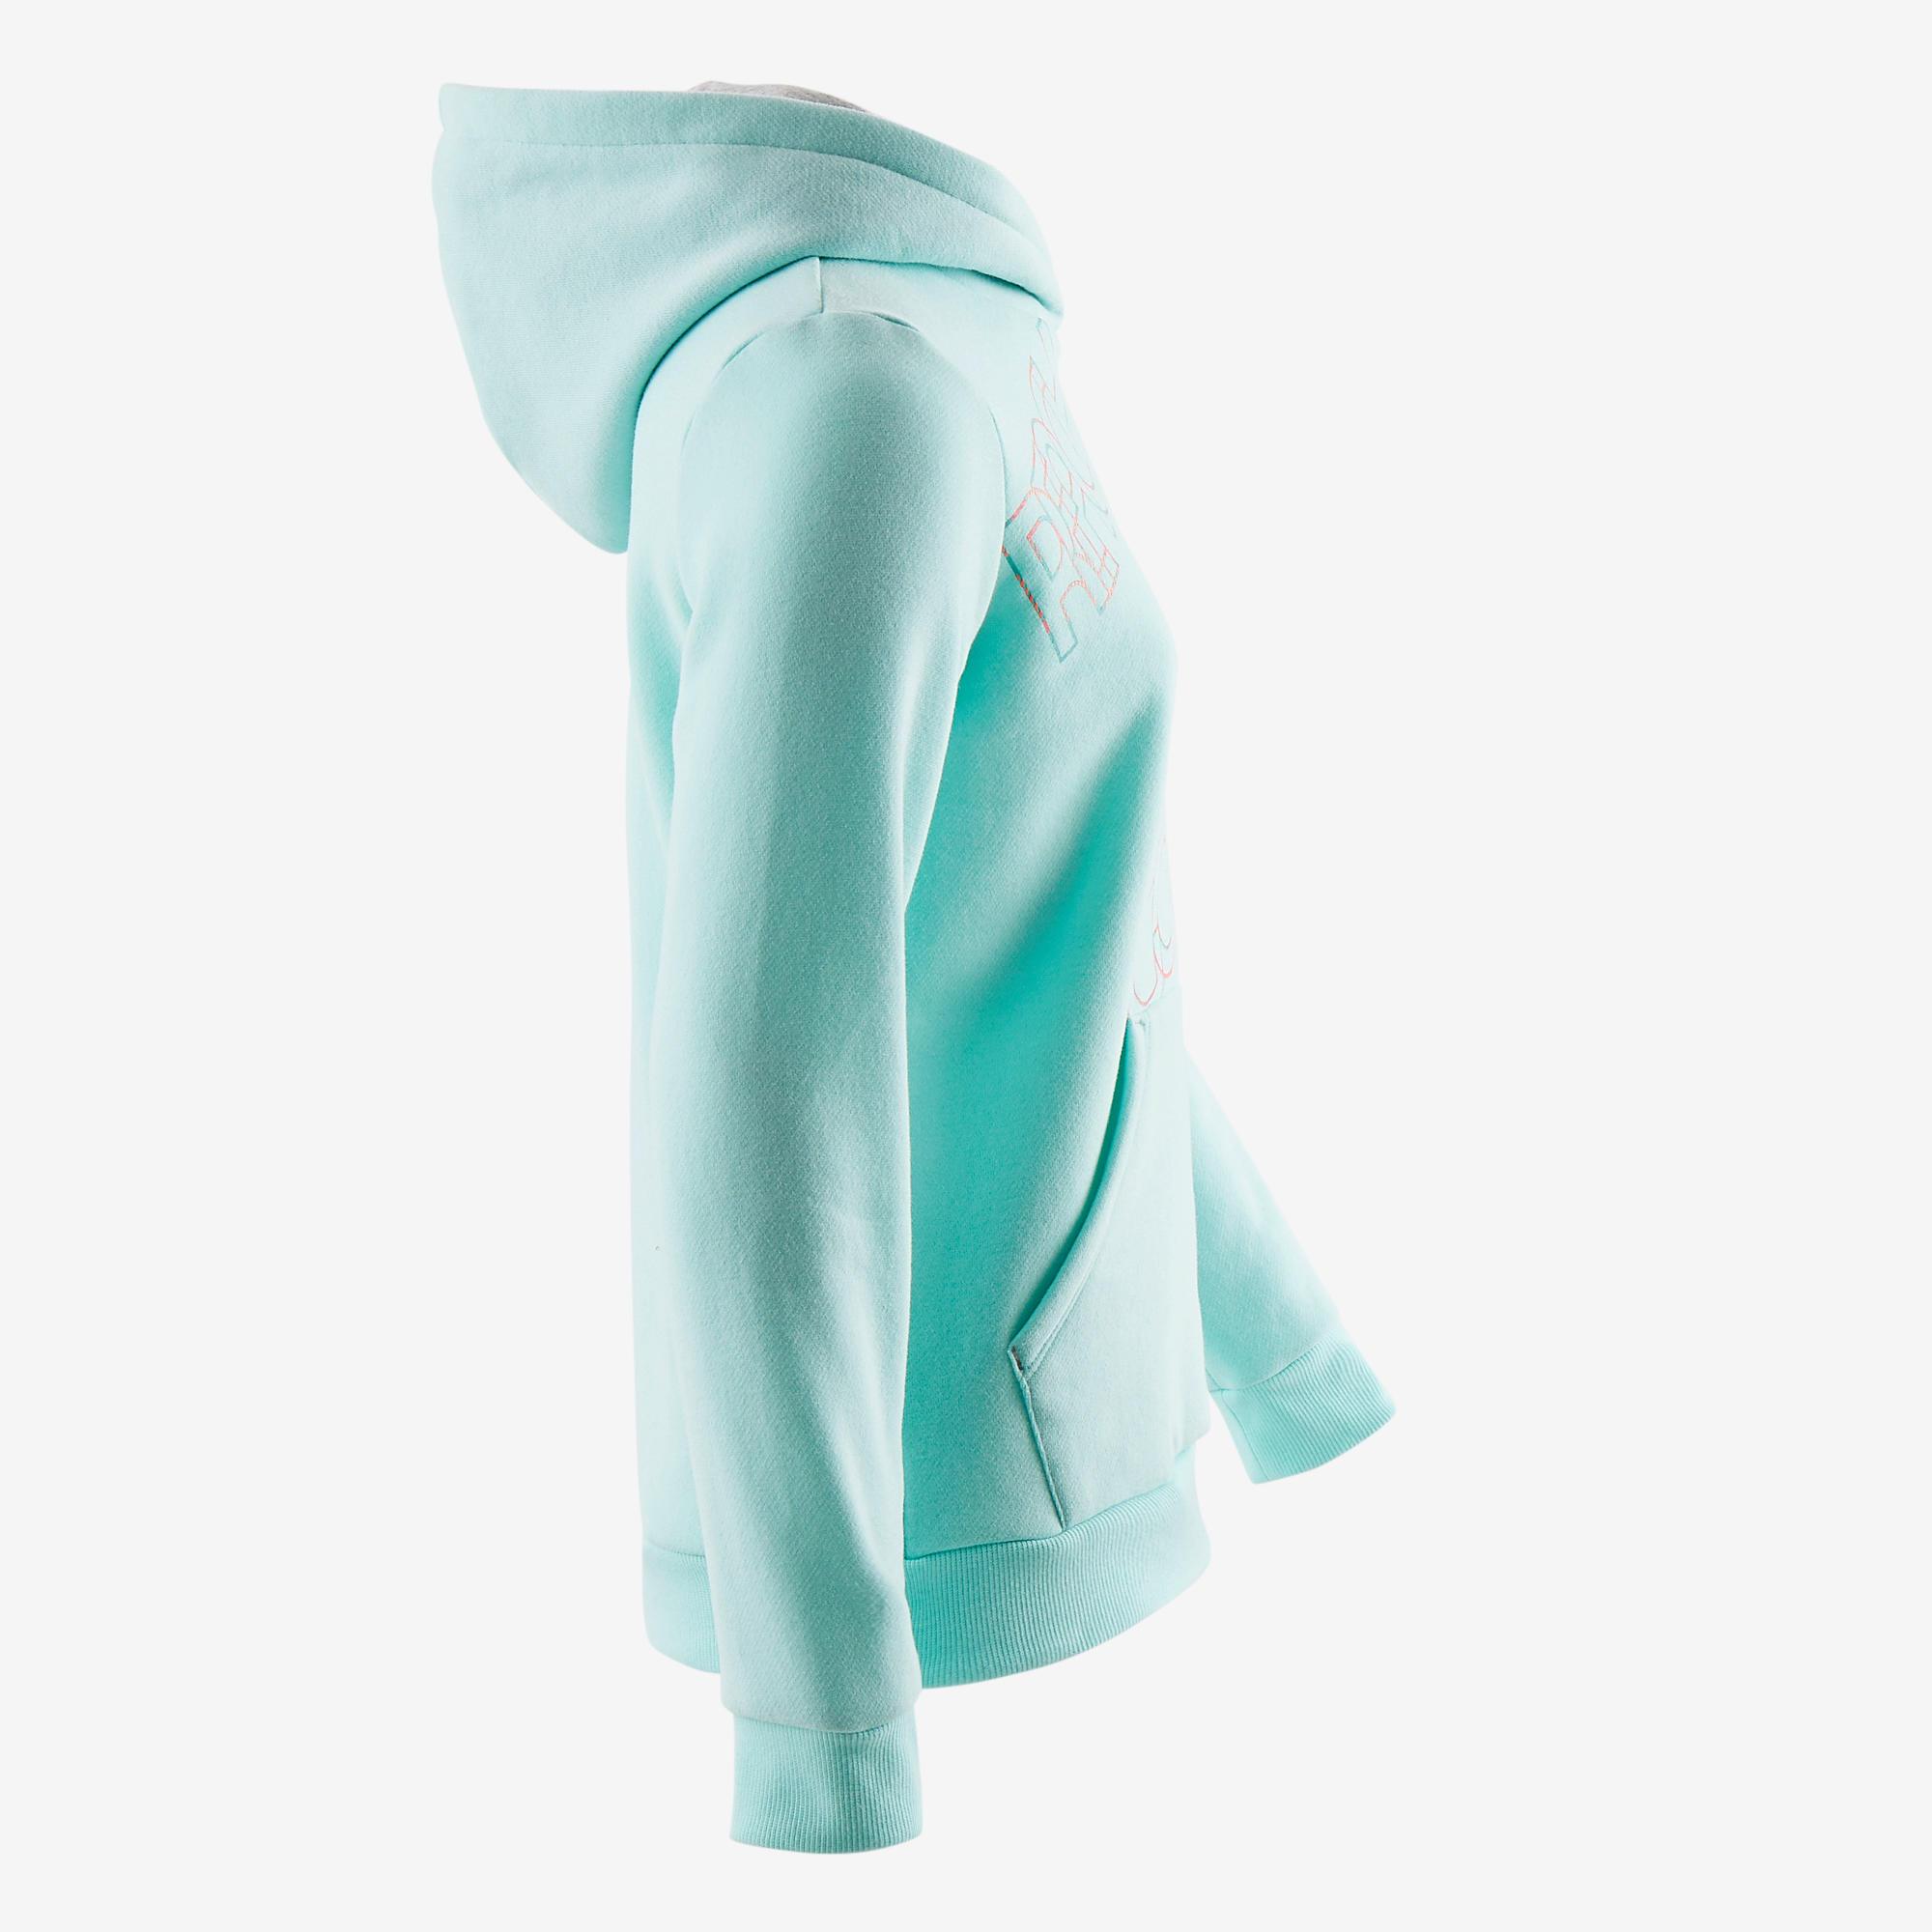 500 Girls' Jersey Gym Sweatshirt - Printed Blue